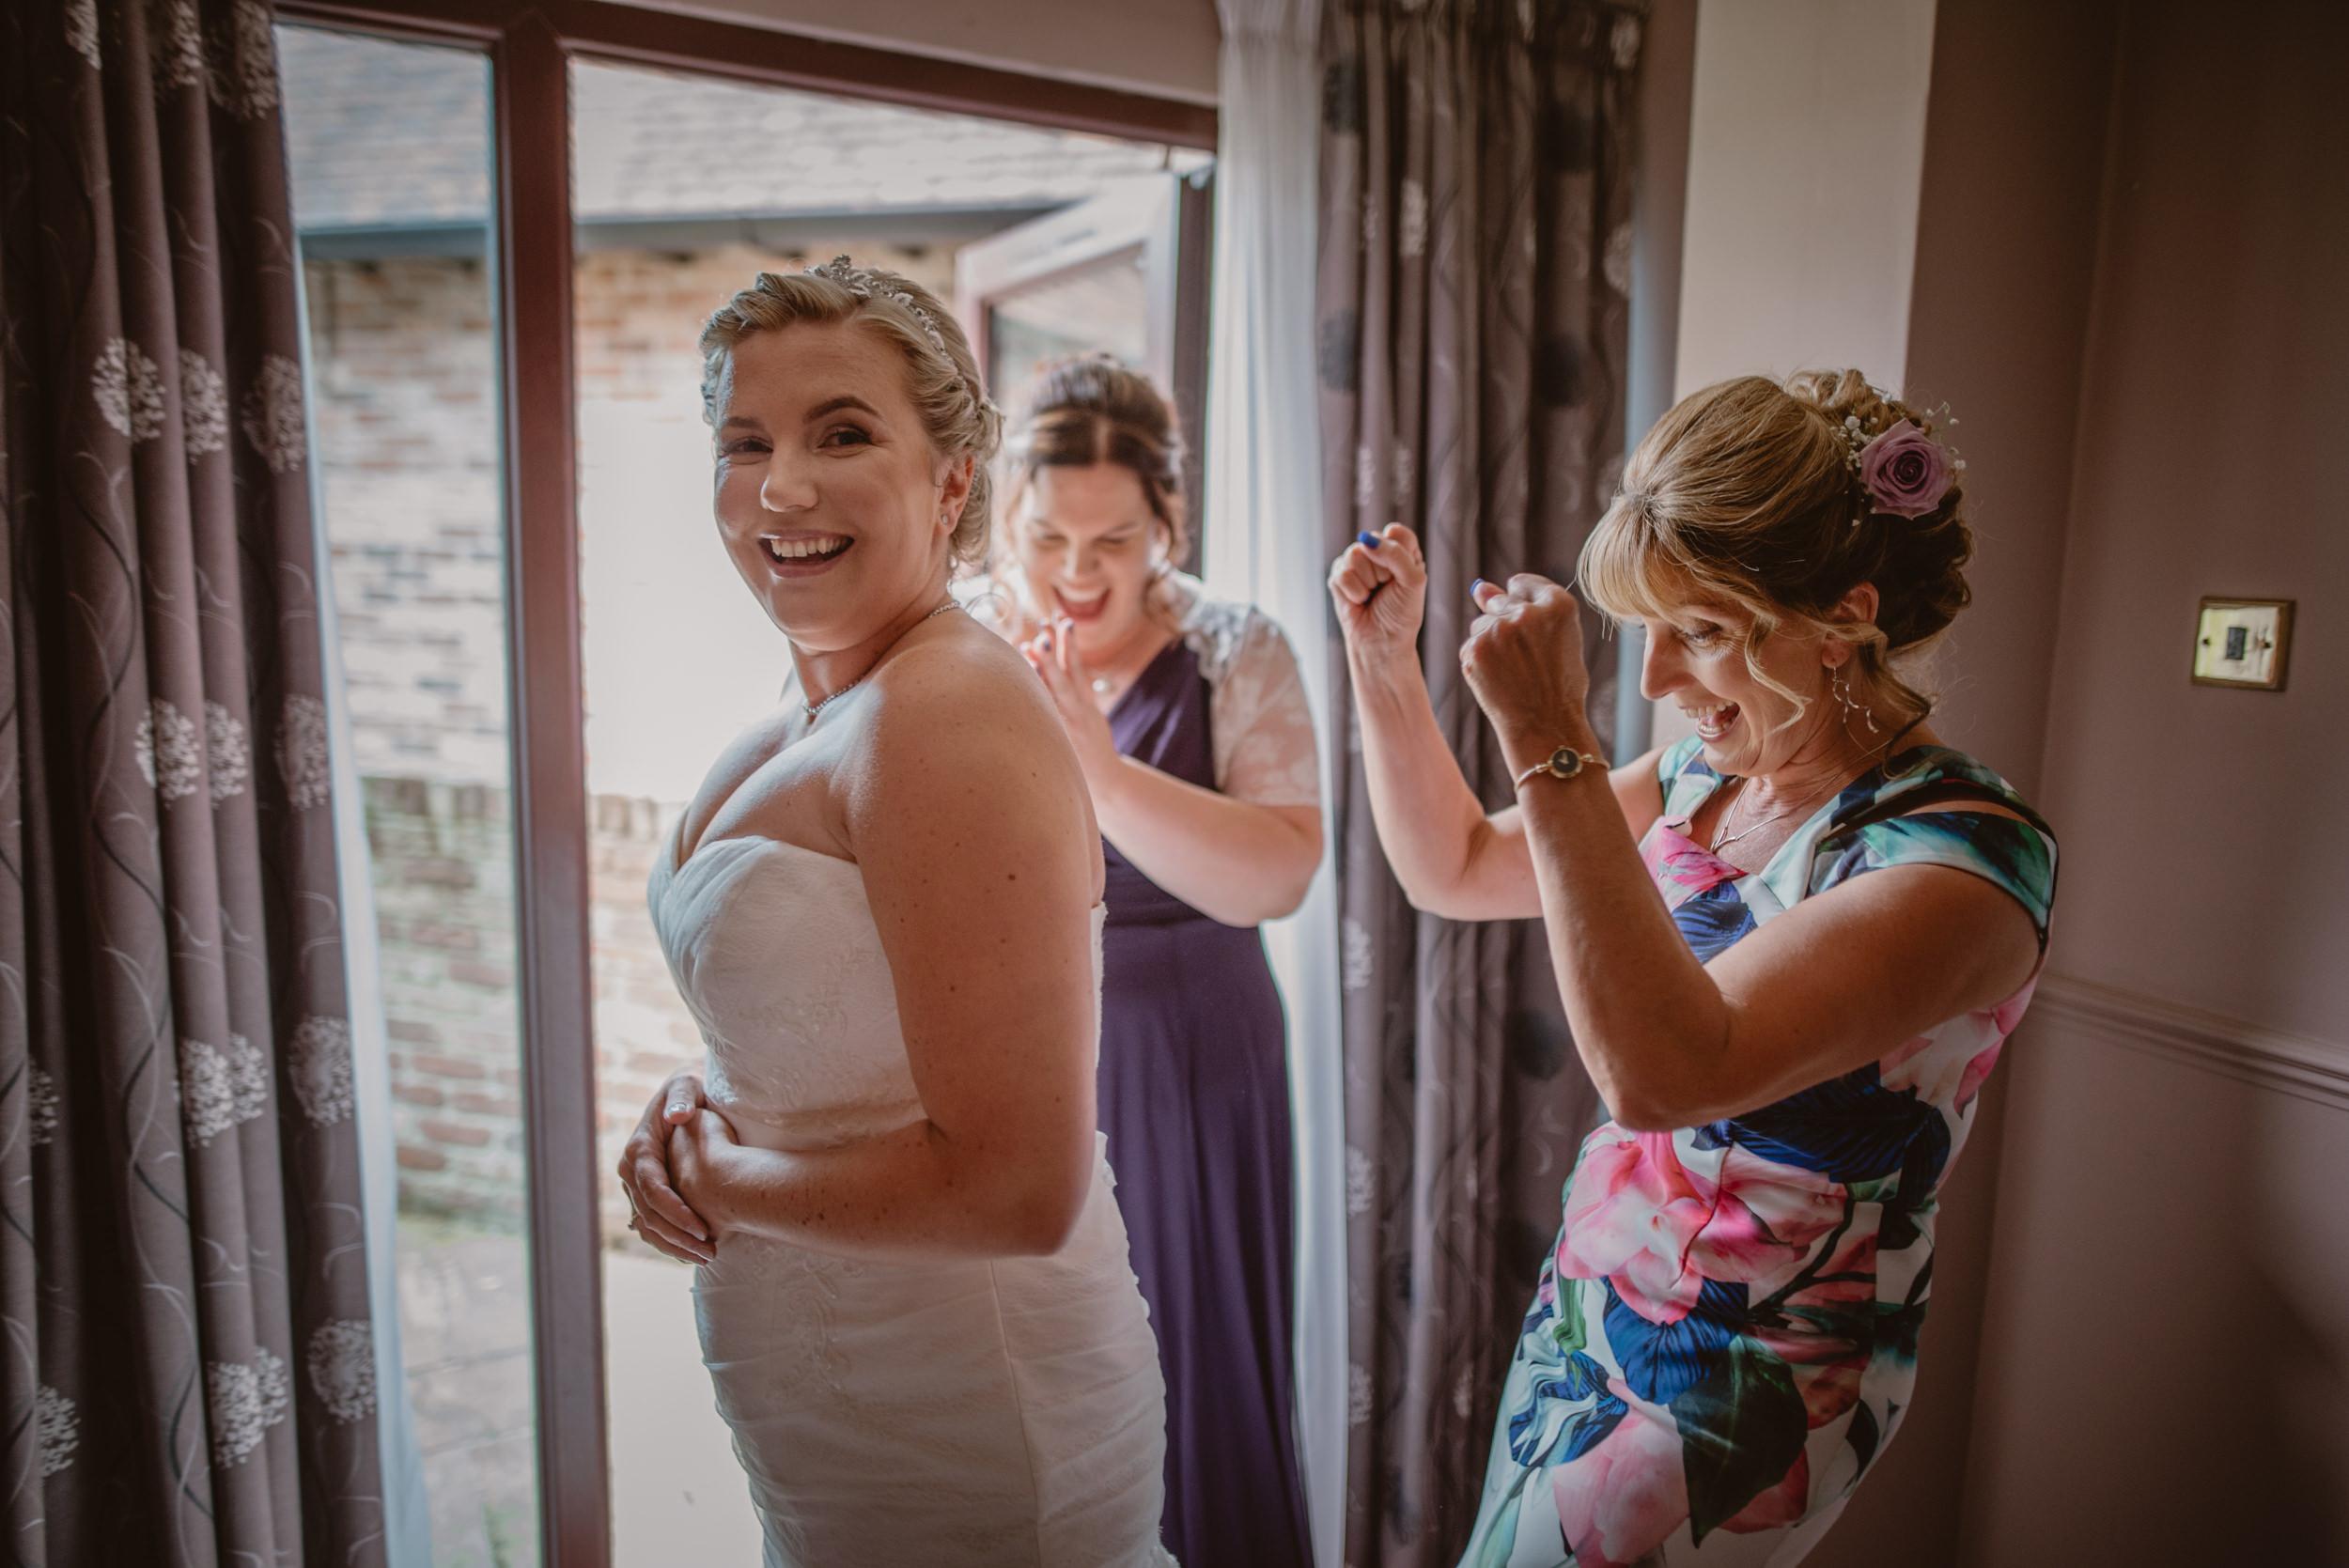 Chantelle-and-Stephen-Old-Thorns-Hotel-Wedding-Liphook-Manu-Mendoza-Wedding-Photography-125.jpg